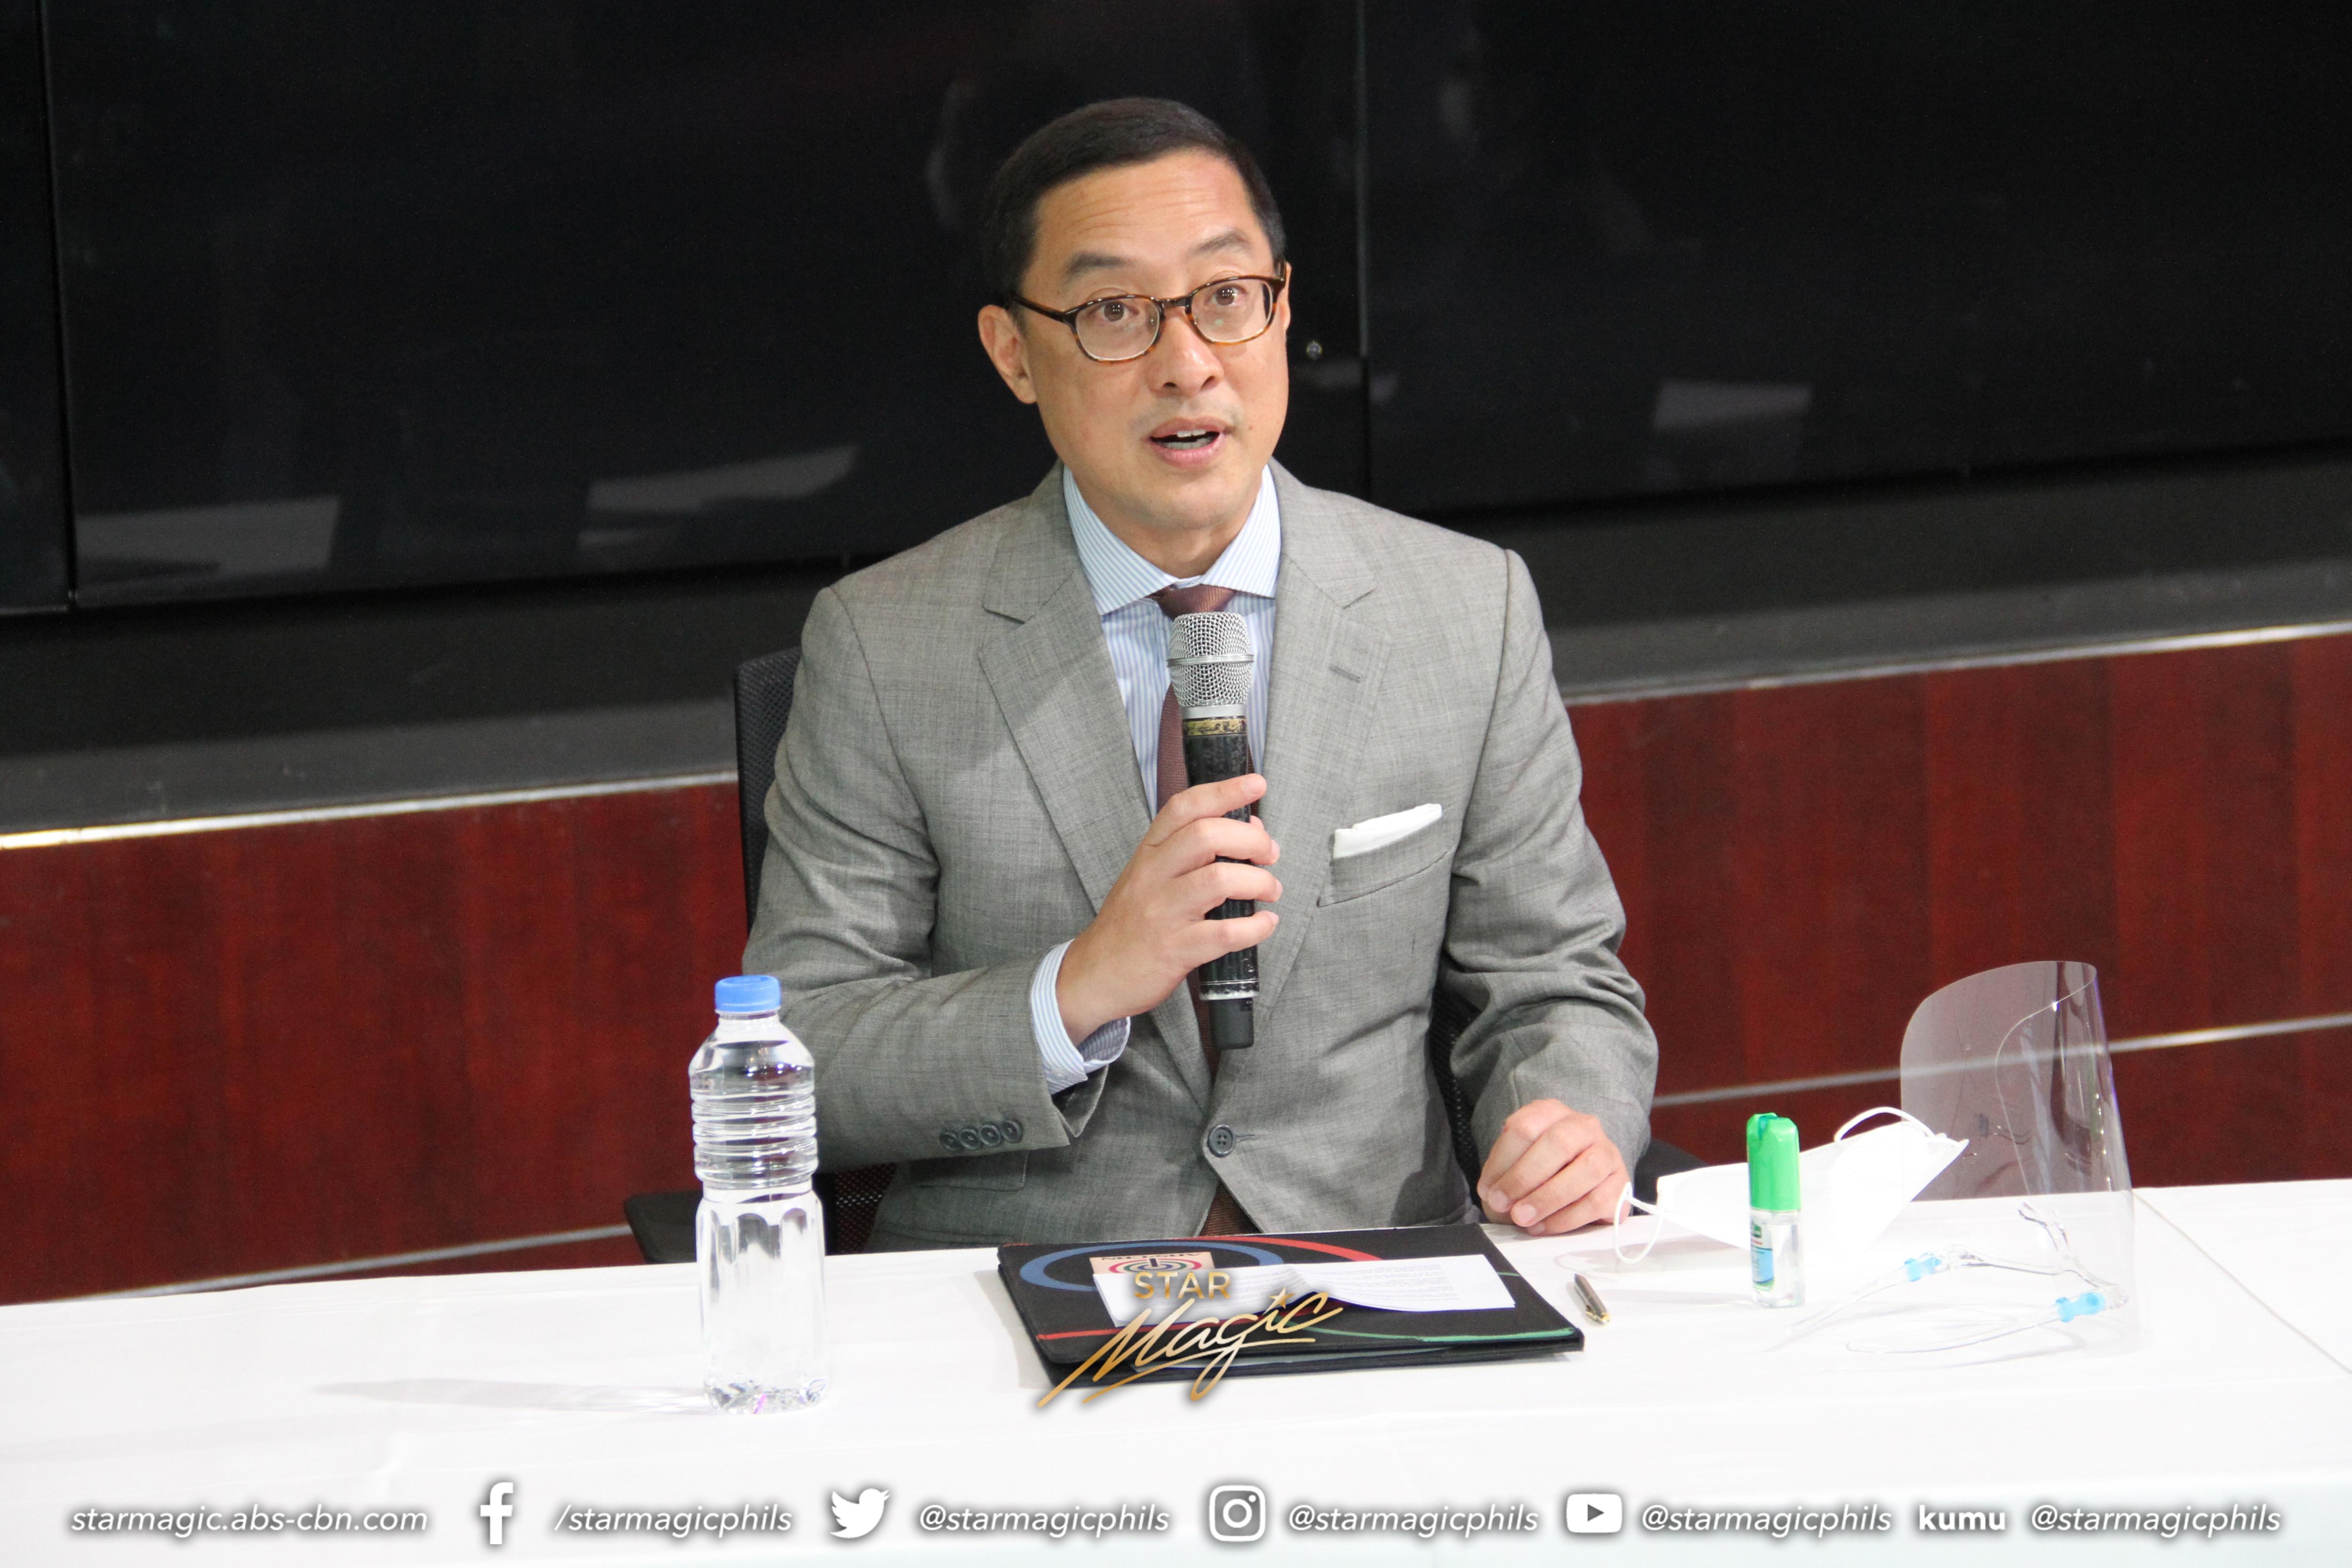 ABS CBN president and CEO Carlo Katigbak